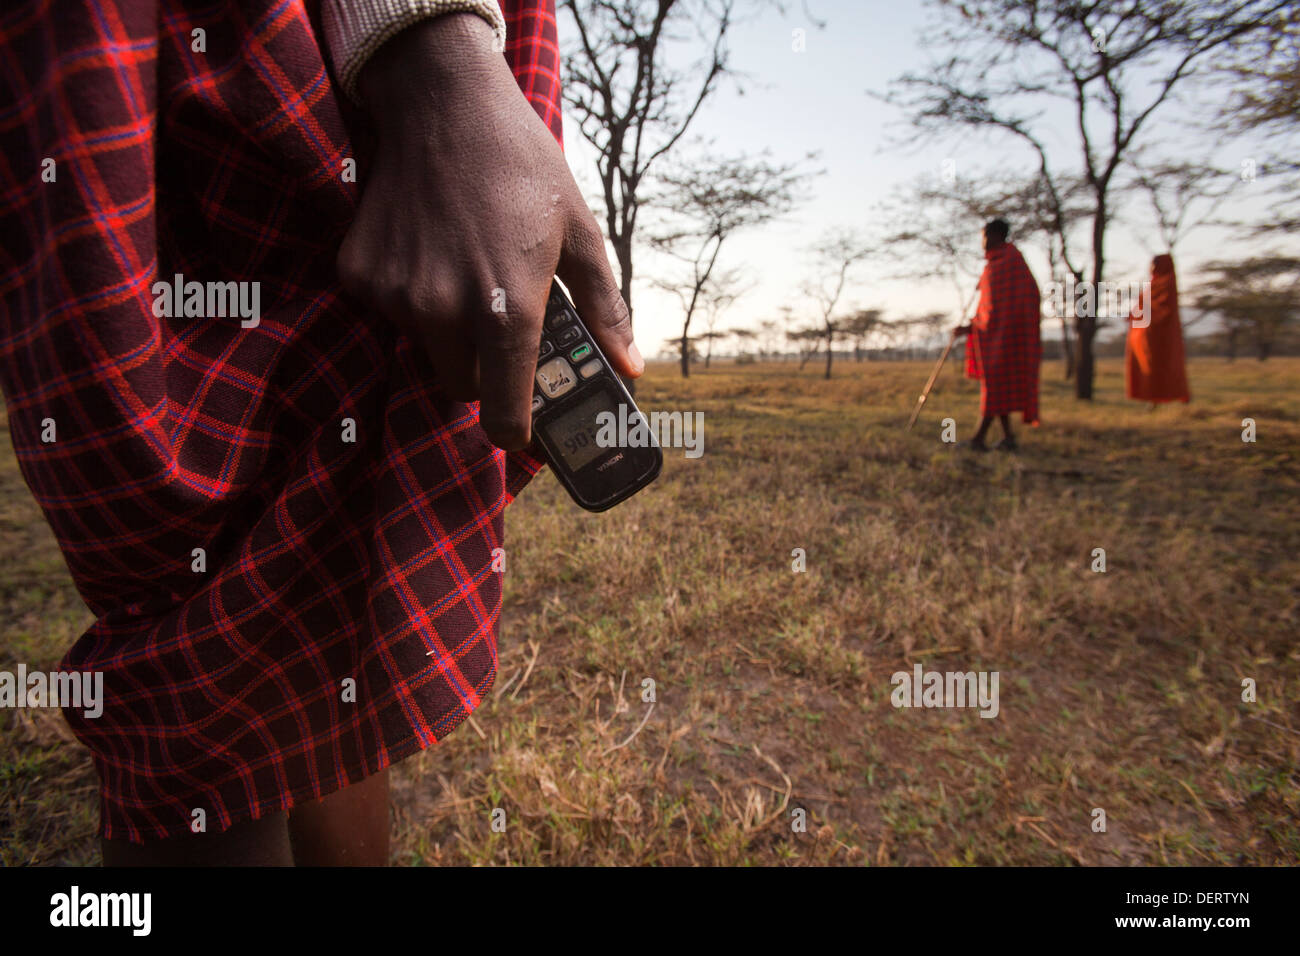 Maasai man holding a Nokia mobile phone, Mara Region, Kenya - Stock Image